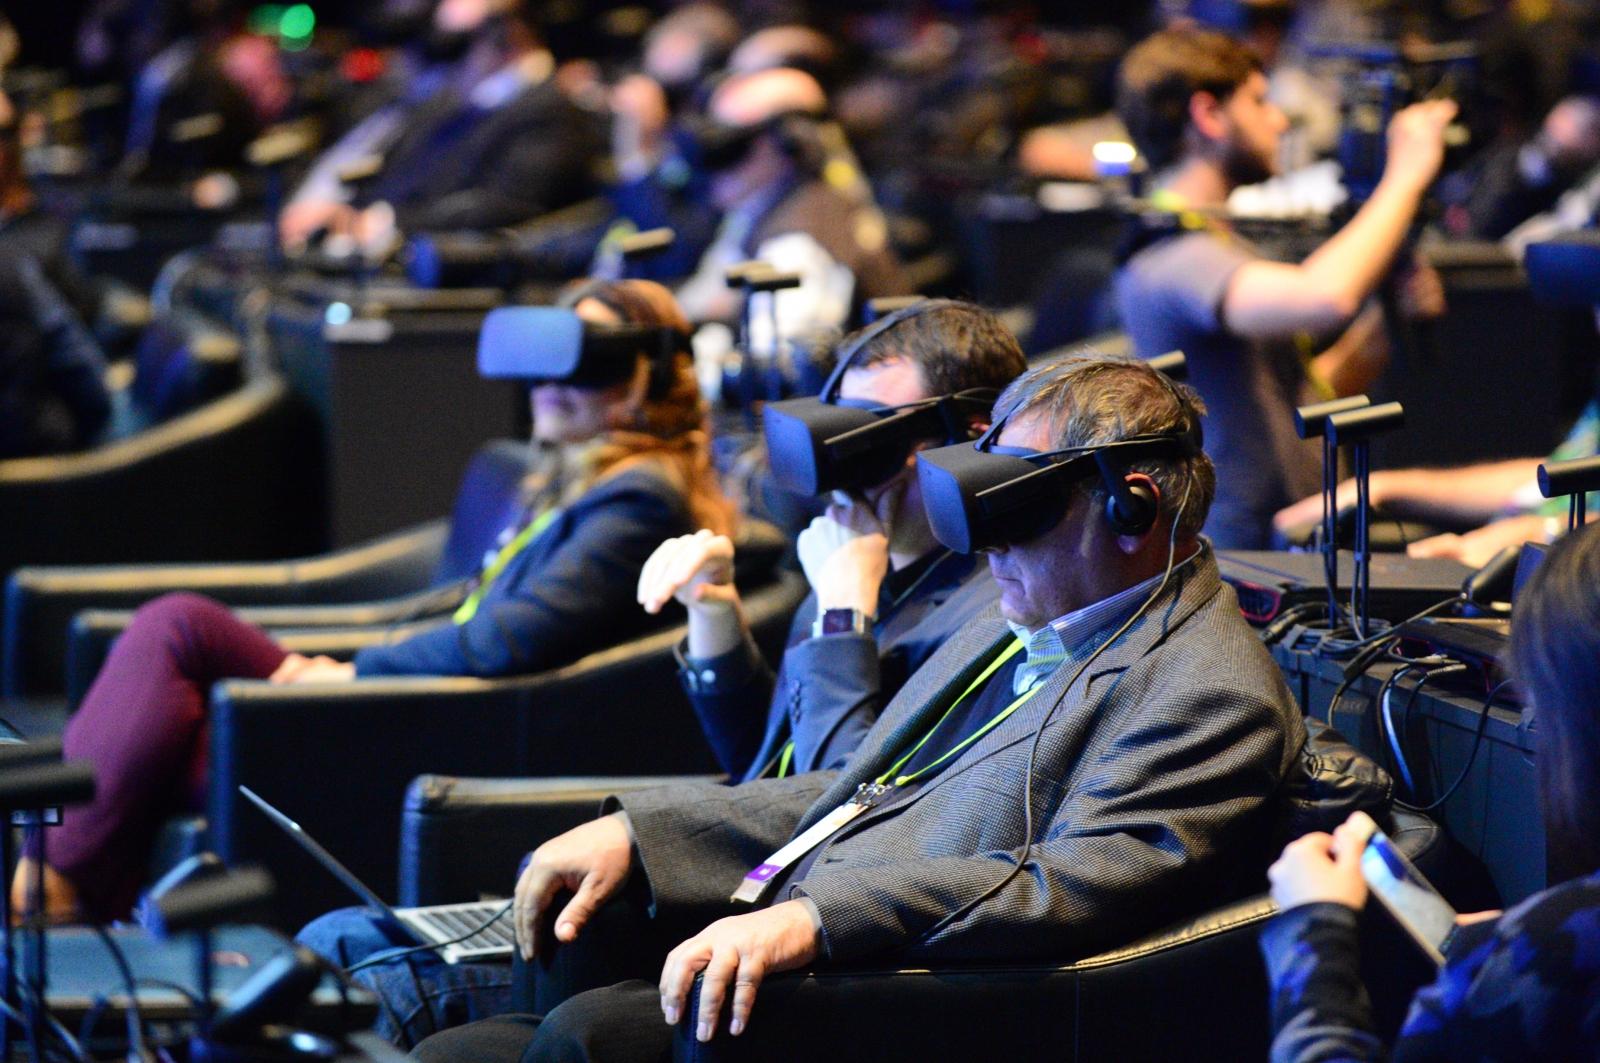 Intel VR headsets